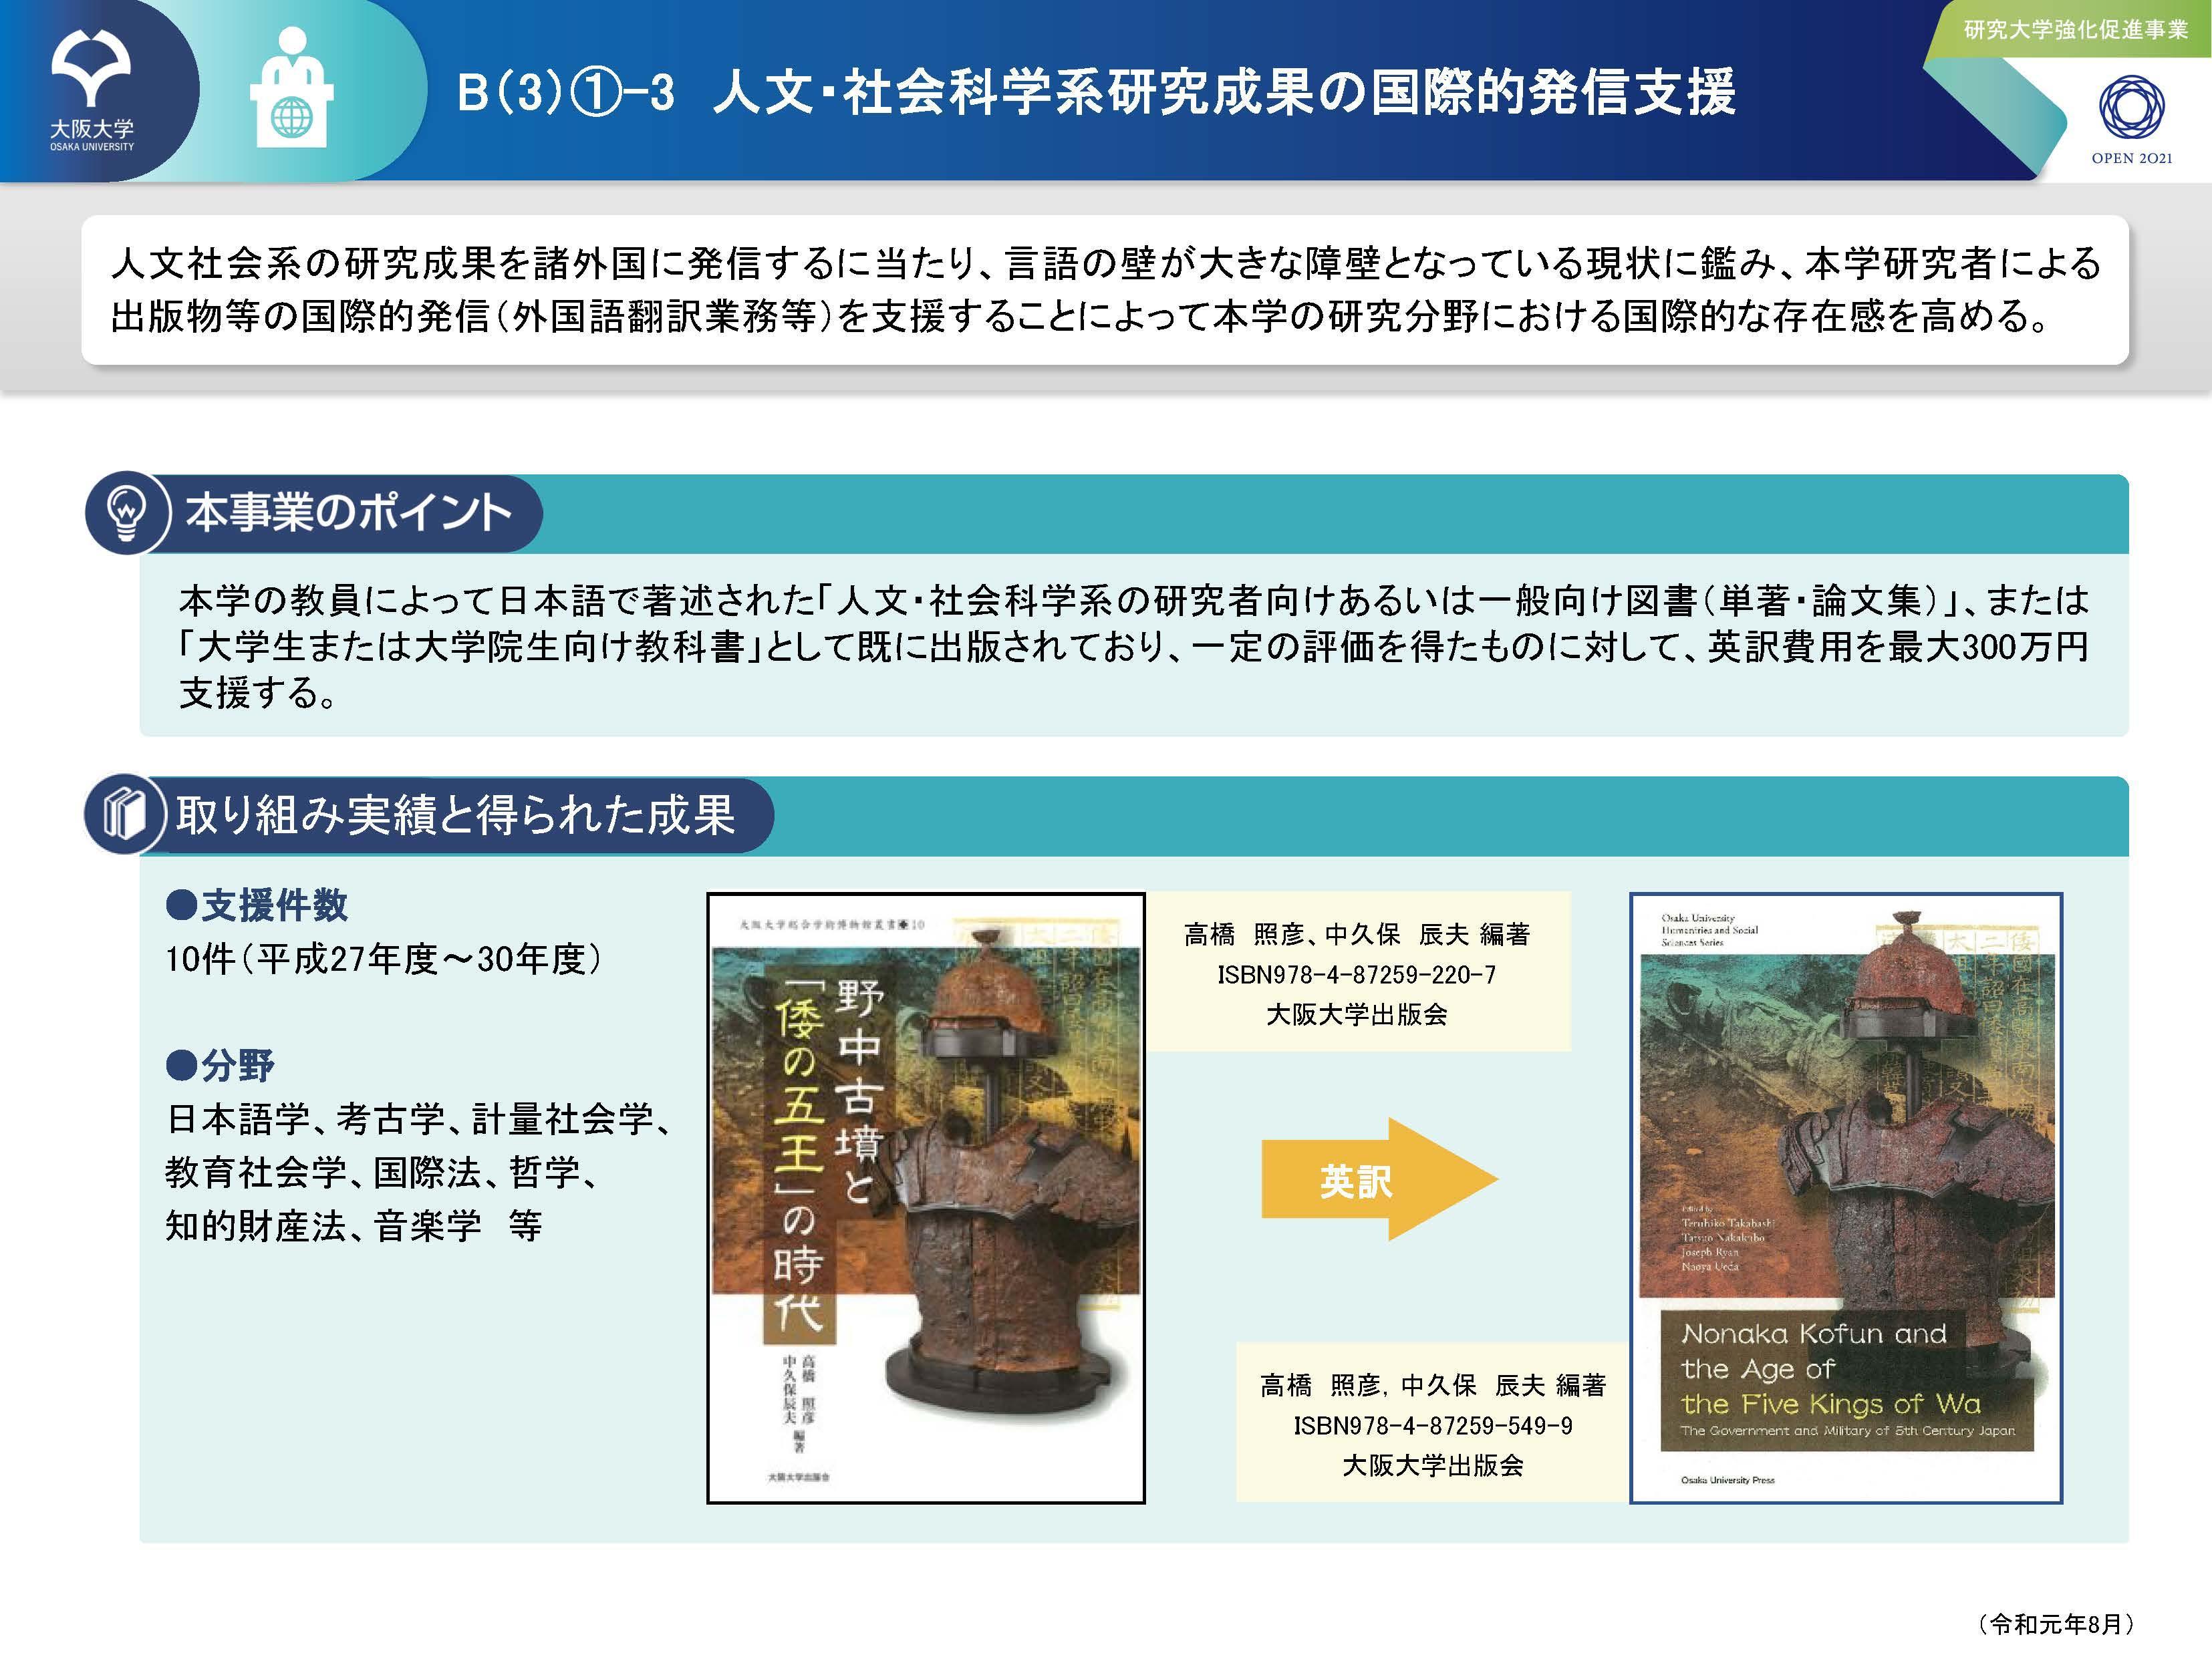 B(3)-1-3 人文・社会科学系研究成果の国際的発信支援